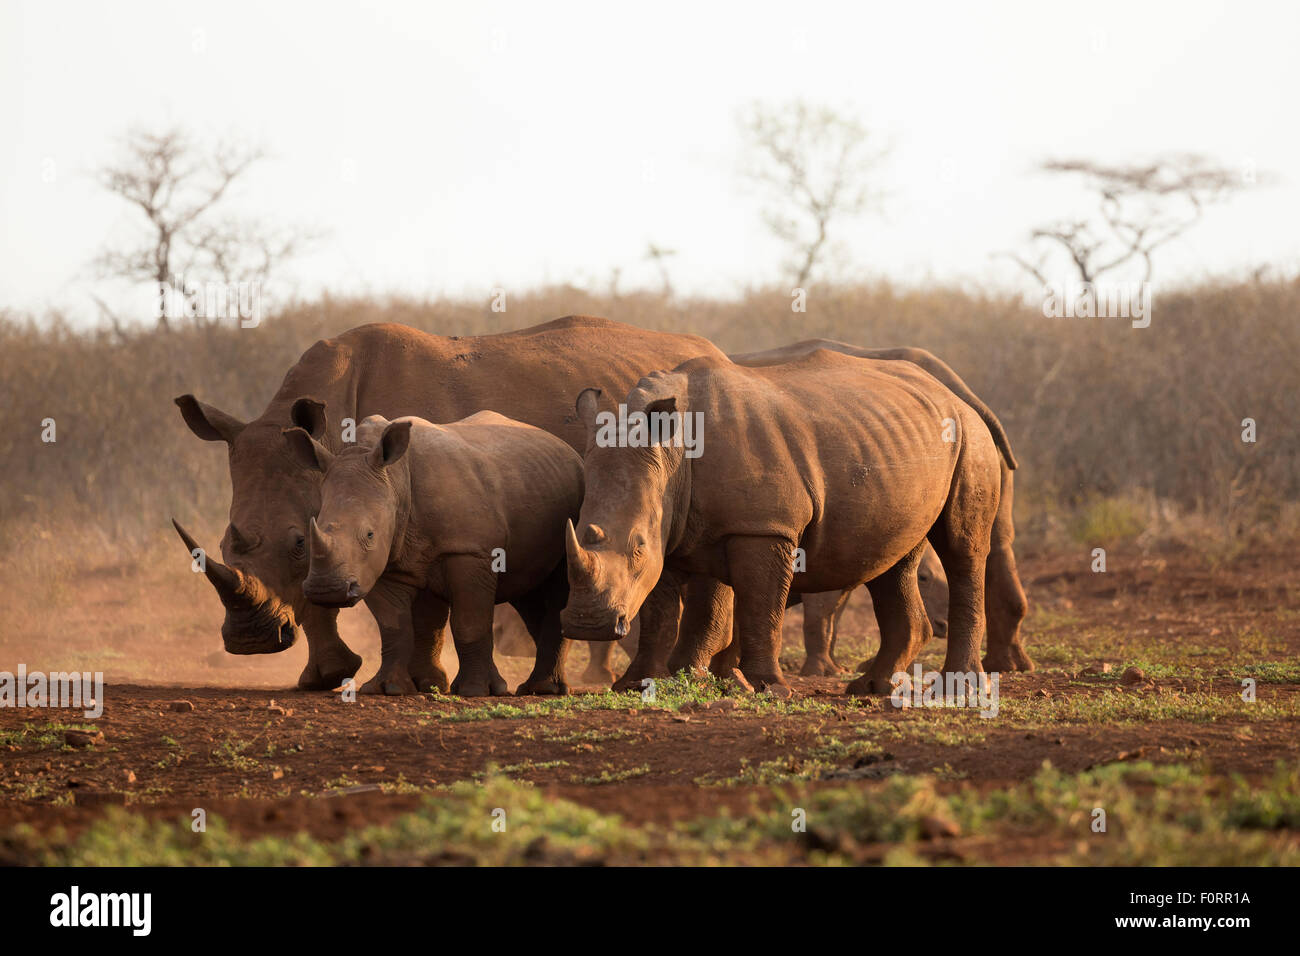 White rhinos (Ceratotherium simum), Zimanga private game reserve, KwaZulu Natal, South Africa - Stock Image